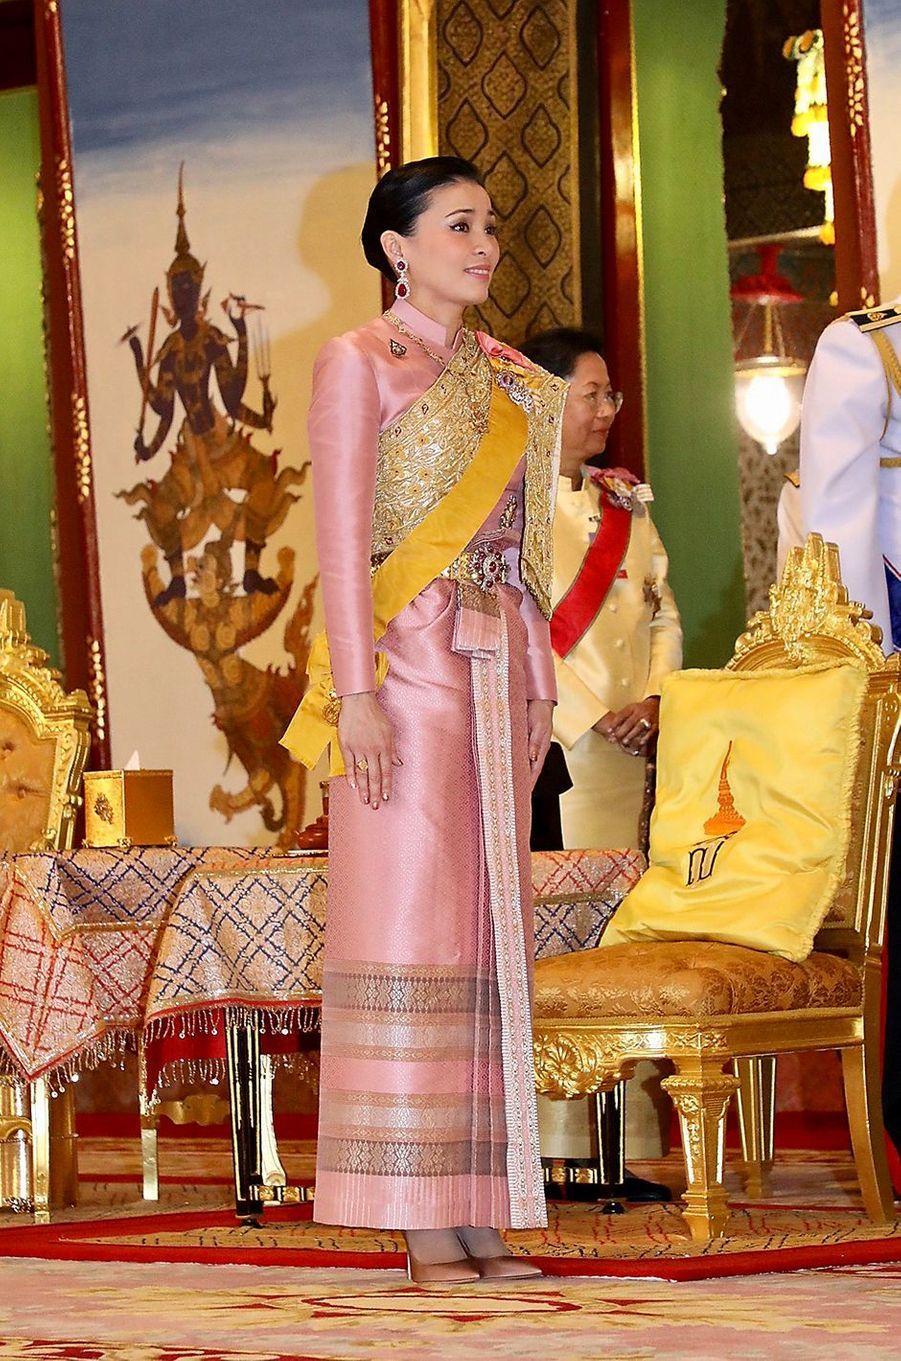 La reine Suthida de Thaïlande à Bangkok, le 4 mai 2019